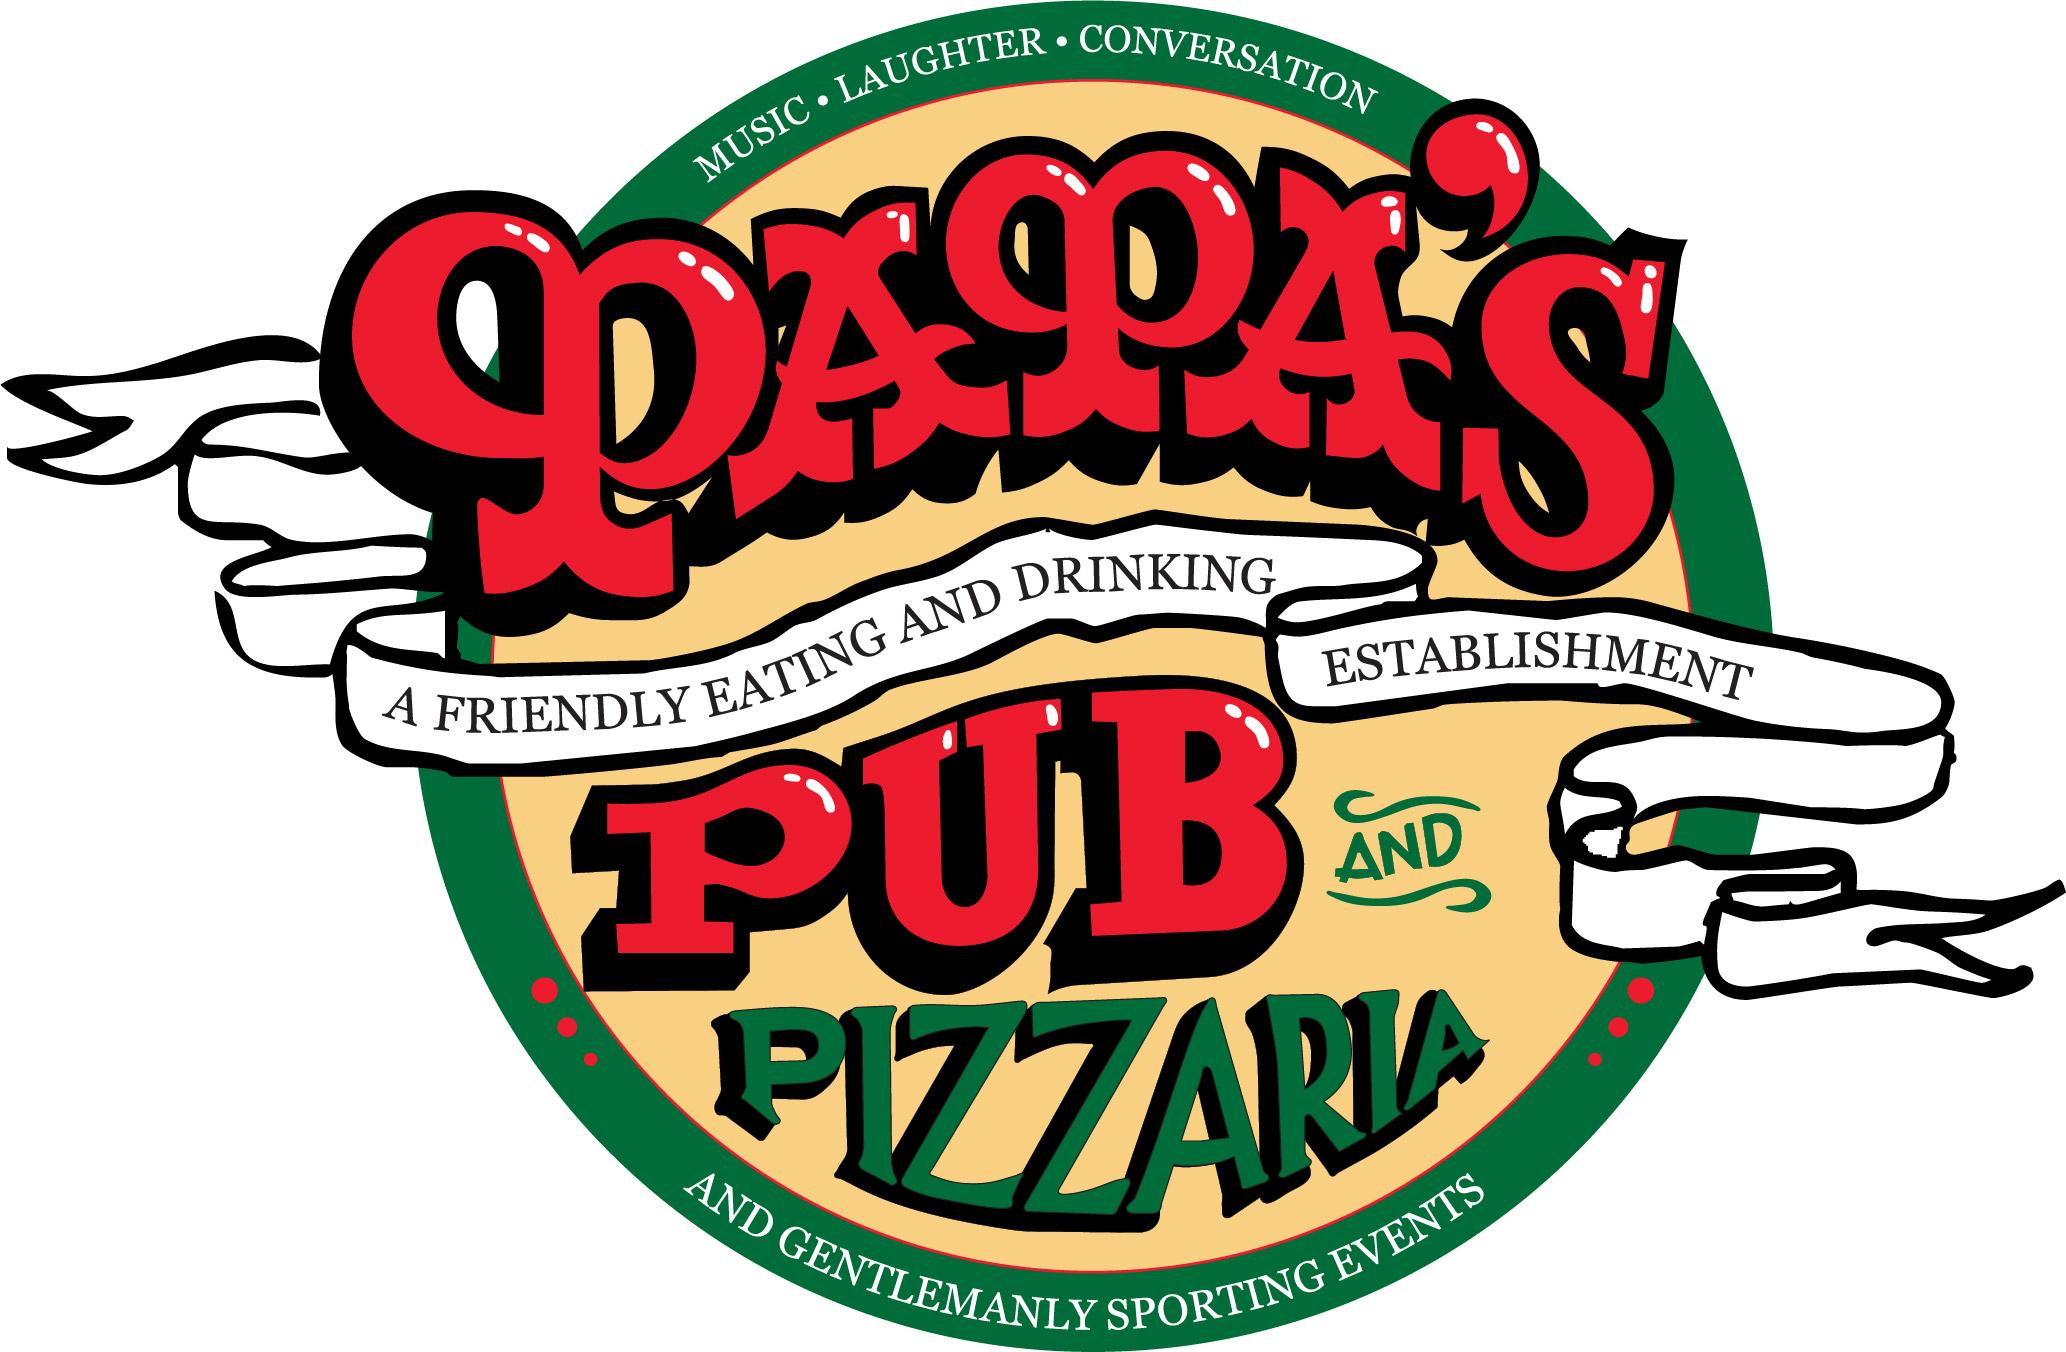 Papa's Pub Pizzaria